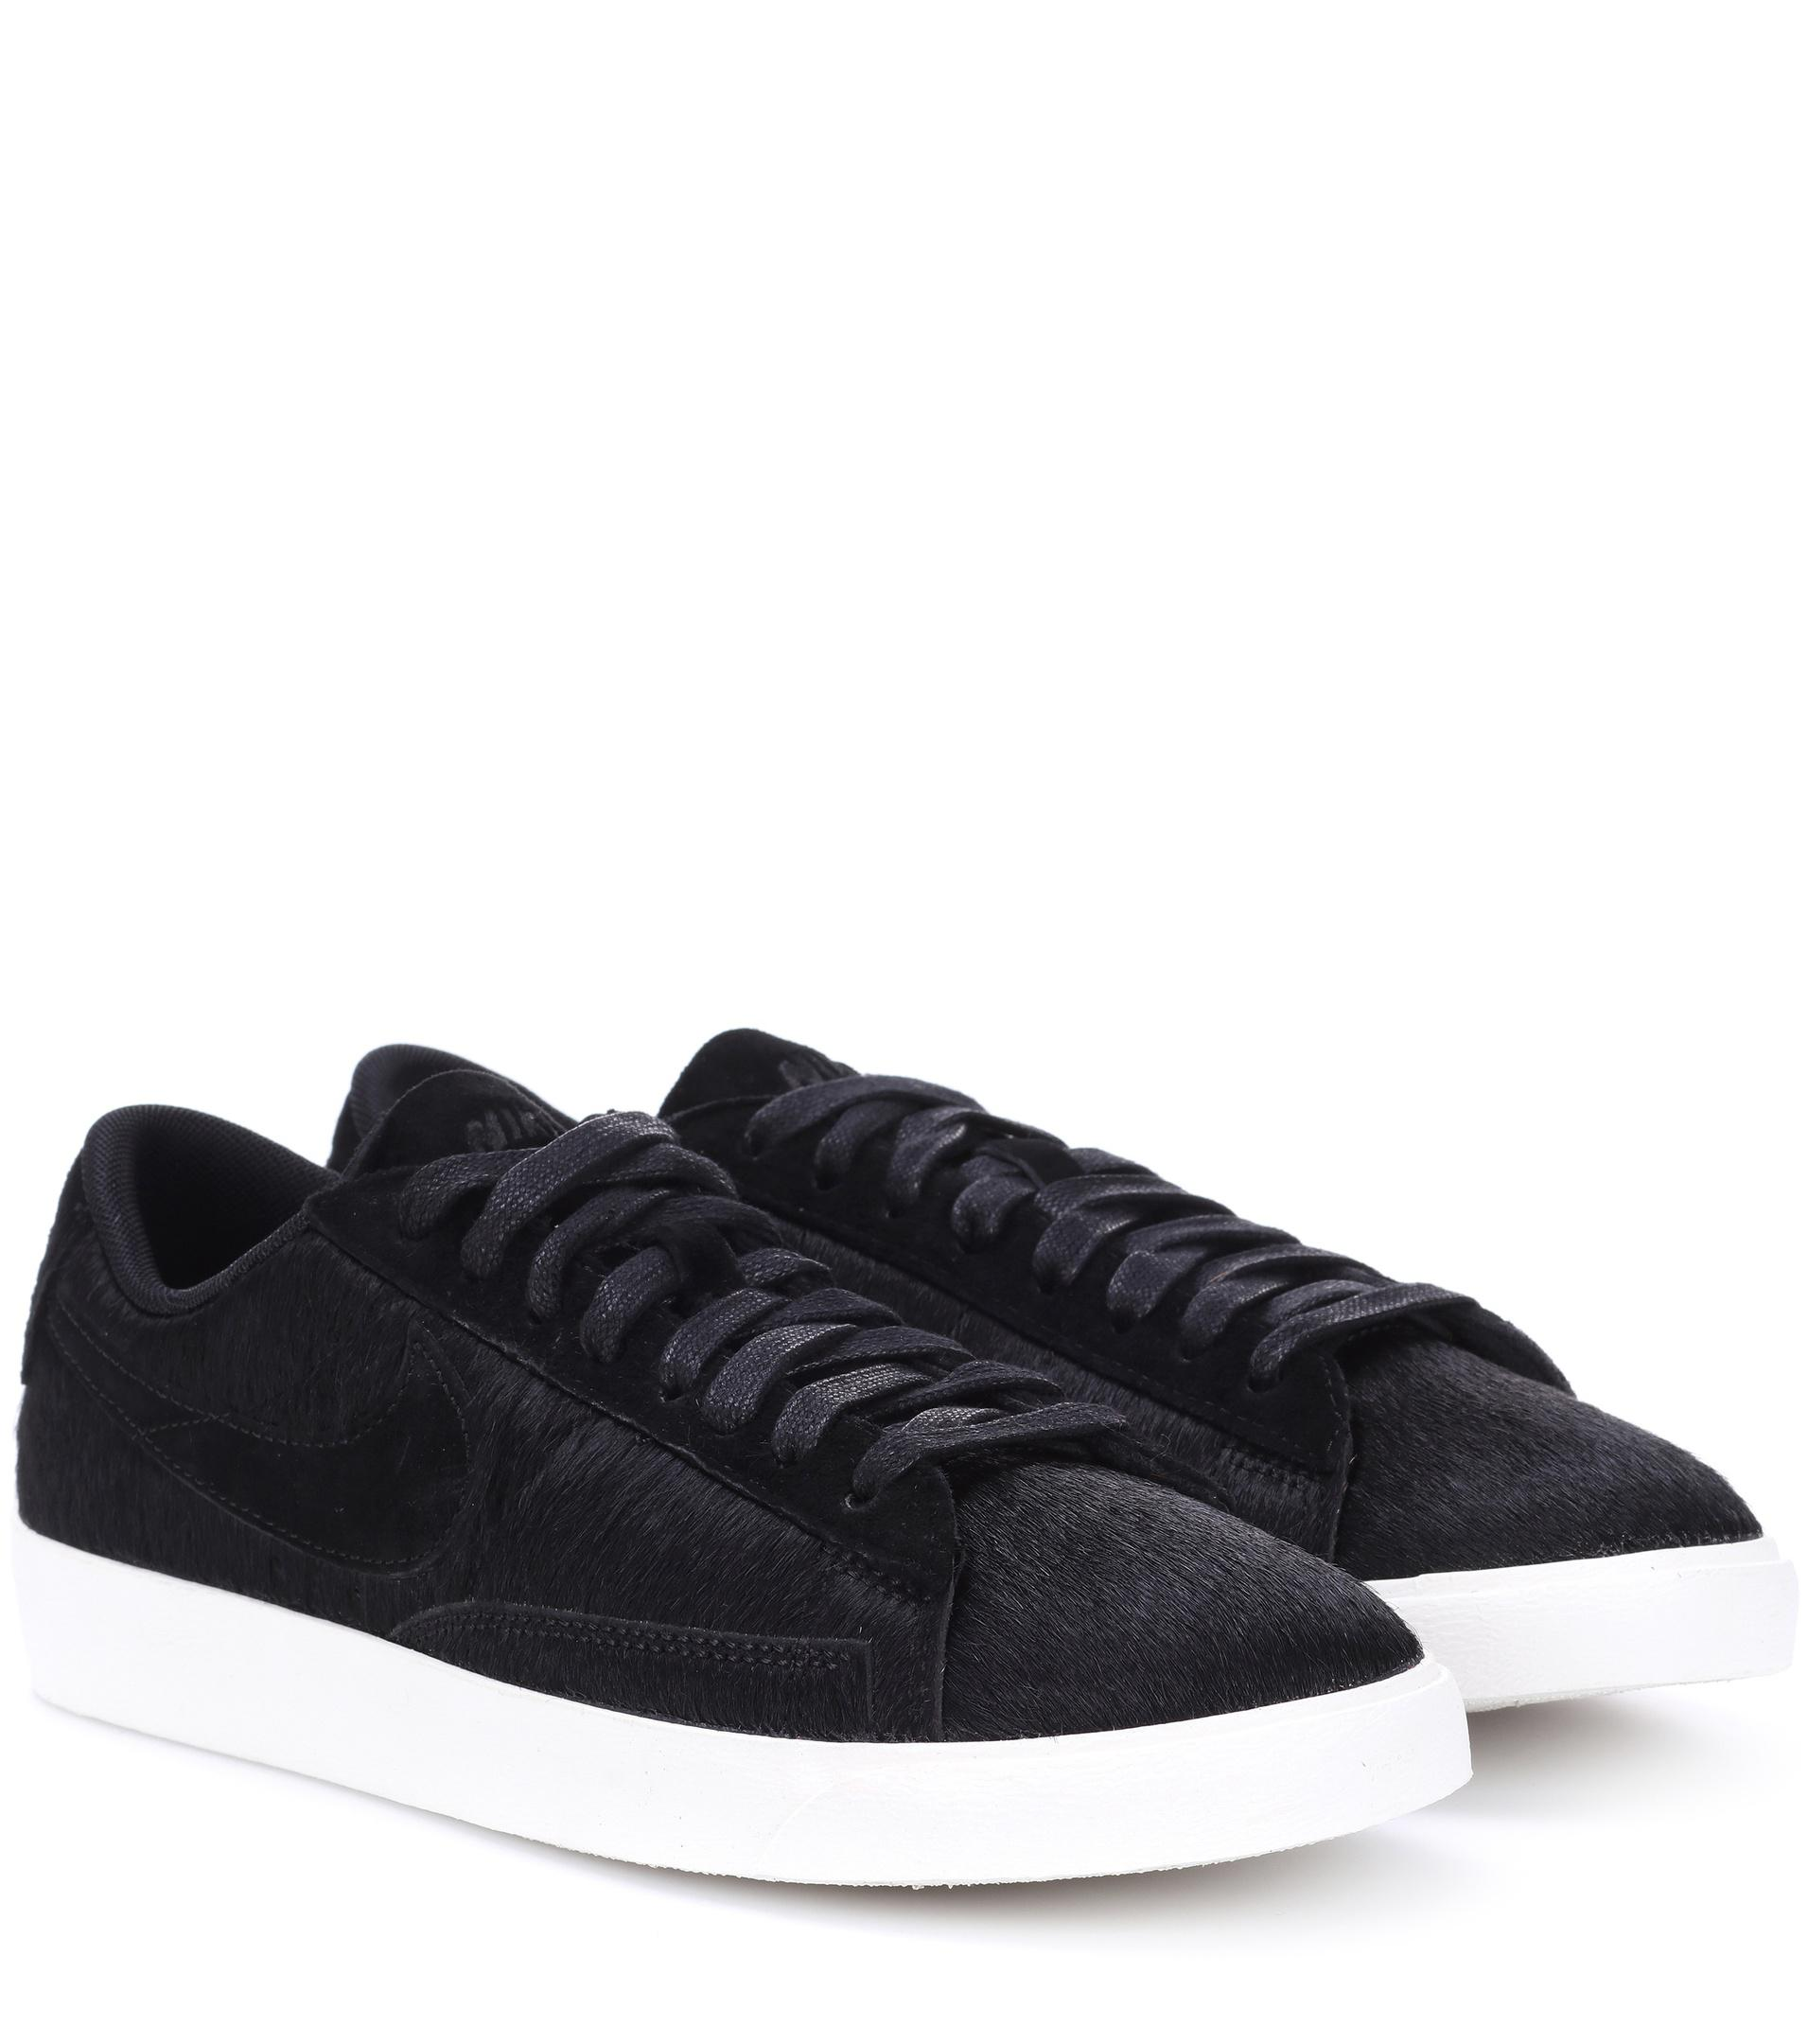 Nike. Women's Black Blazer Low Calf Hair Sneakers